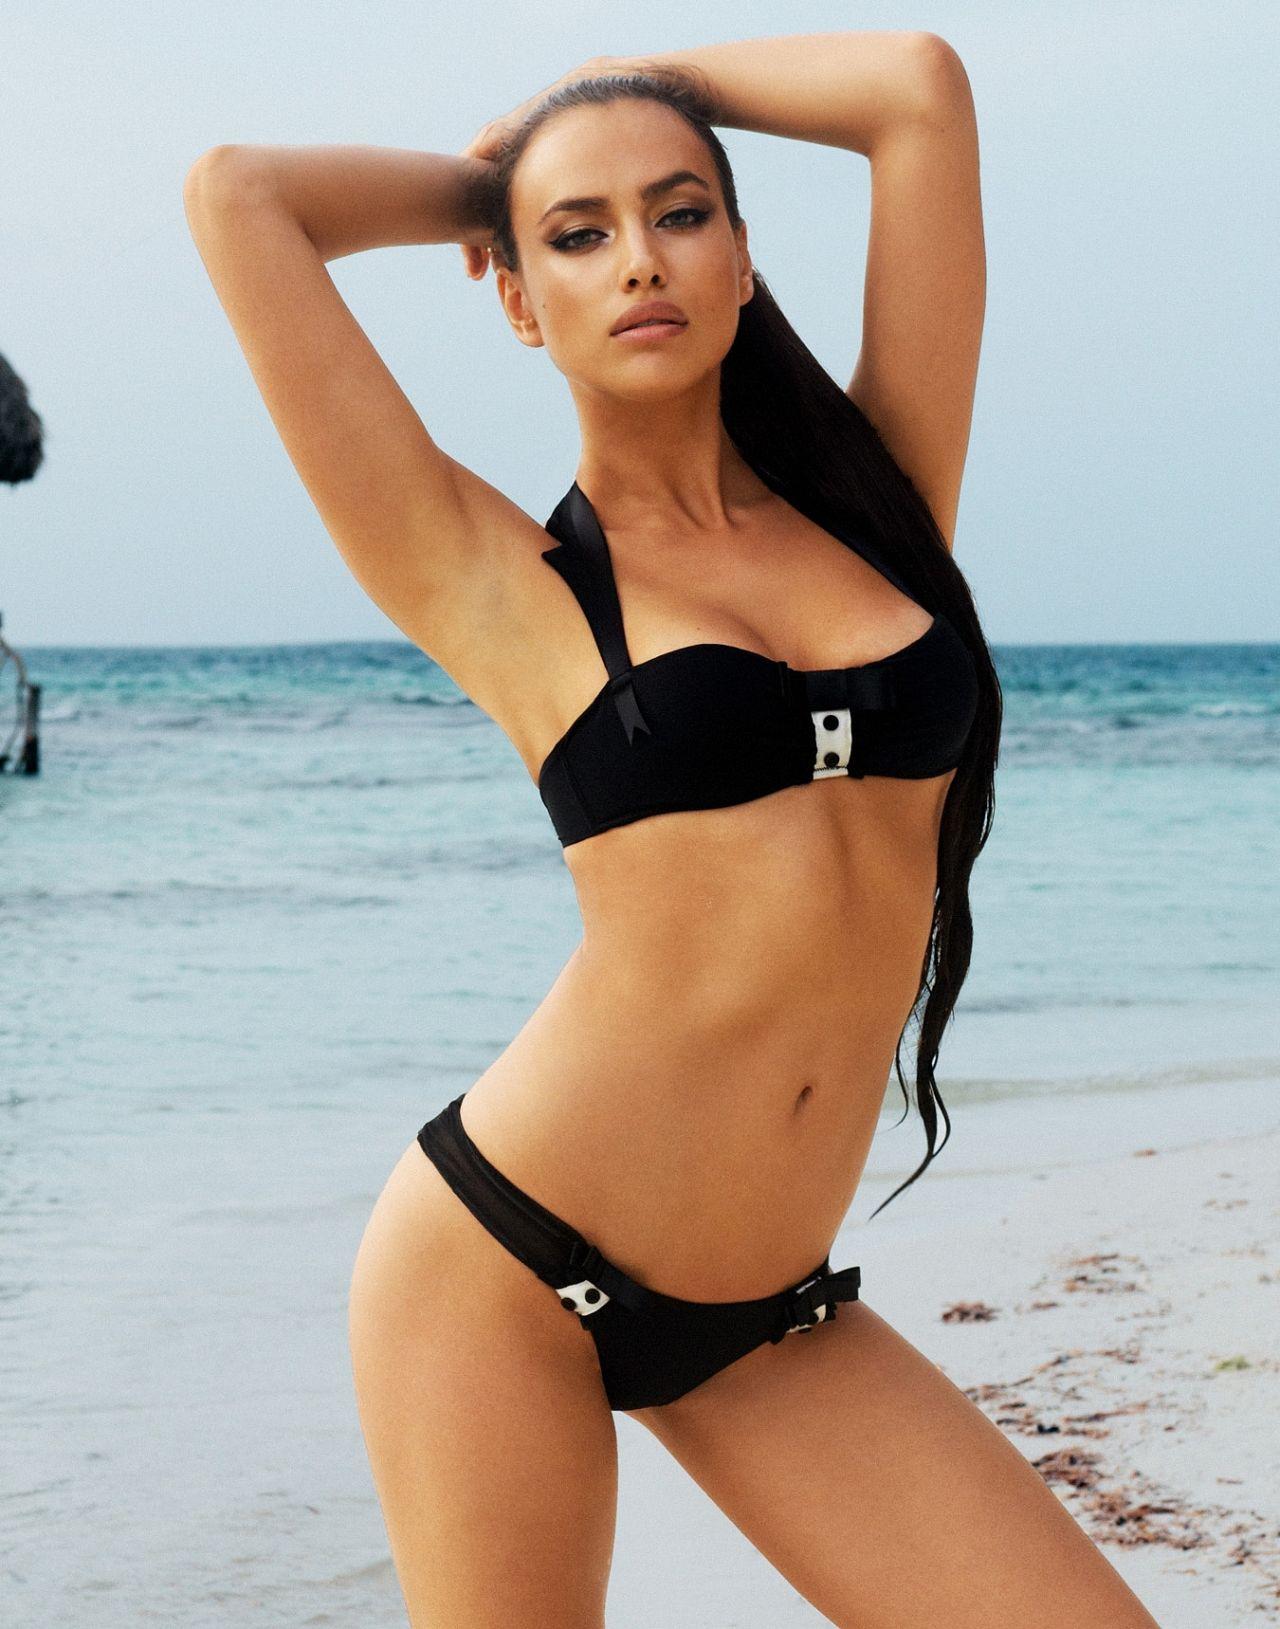 Rinaldos Freundin Bikini Bild